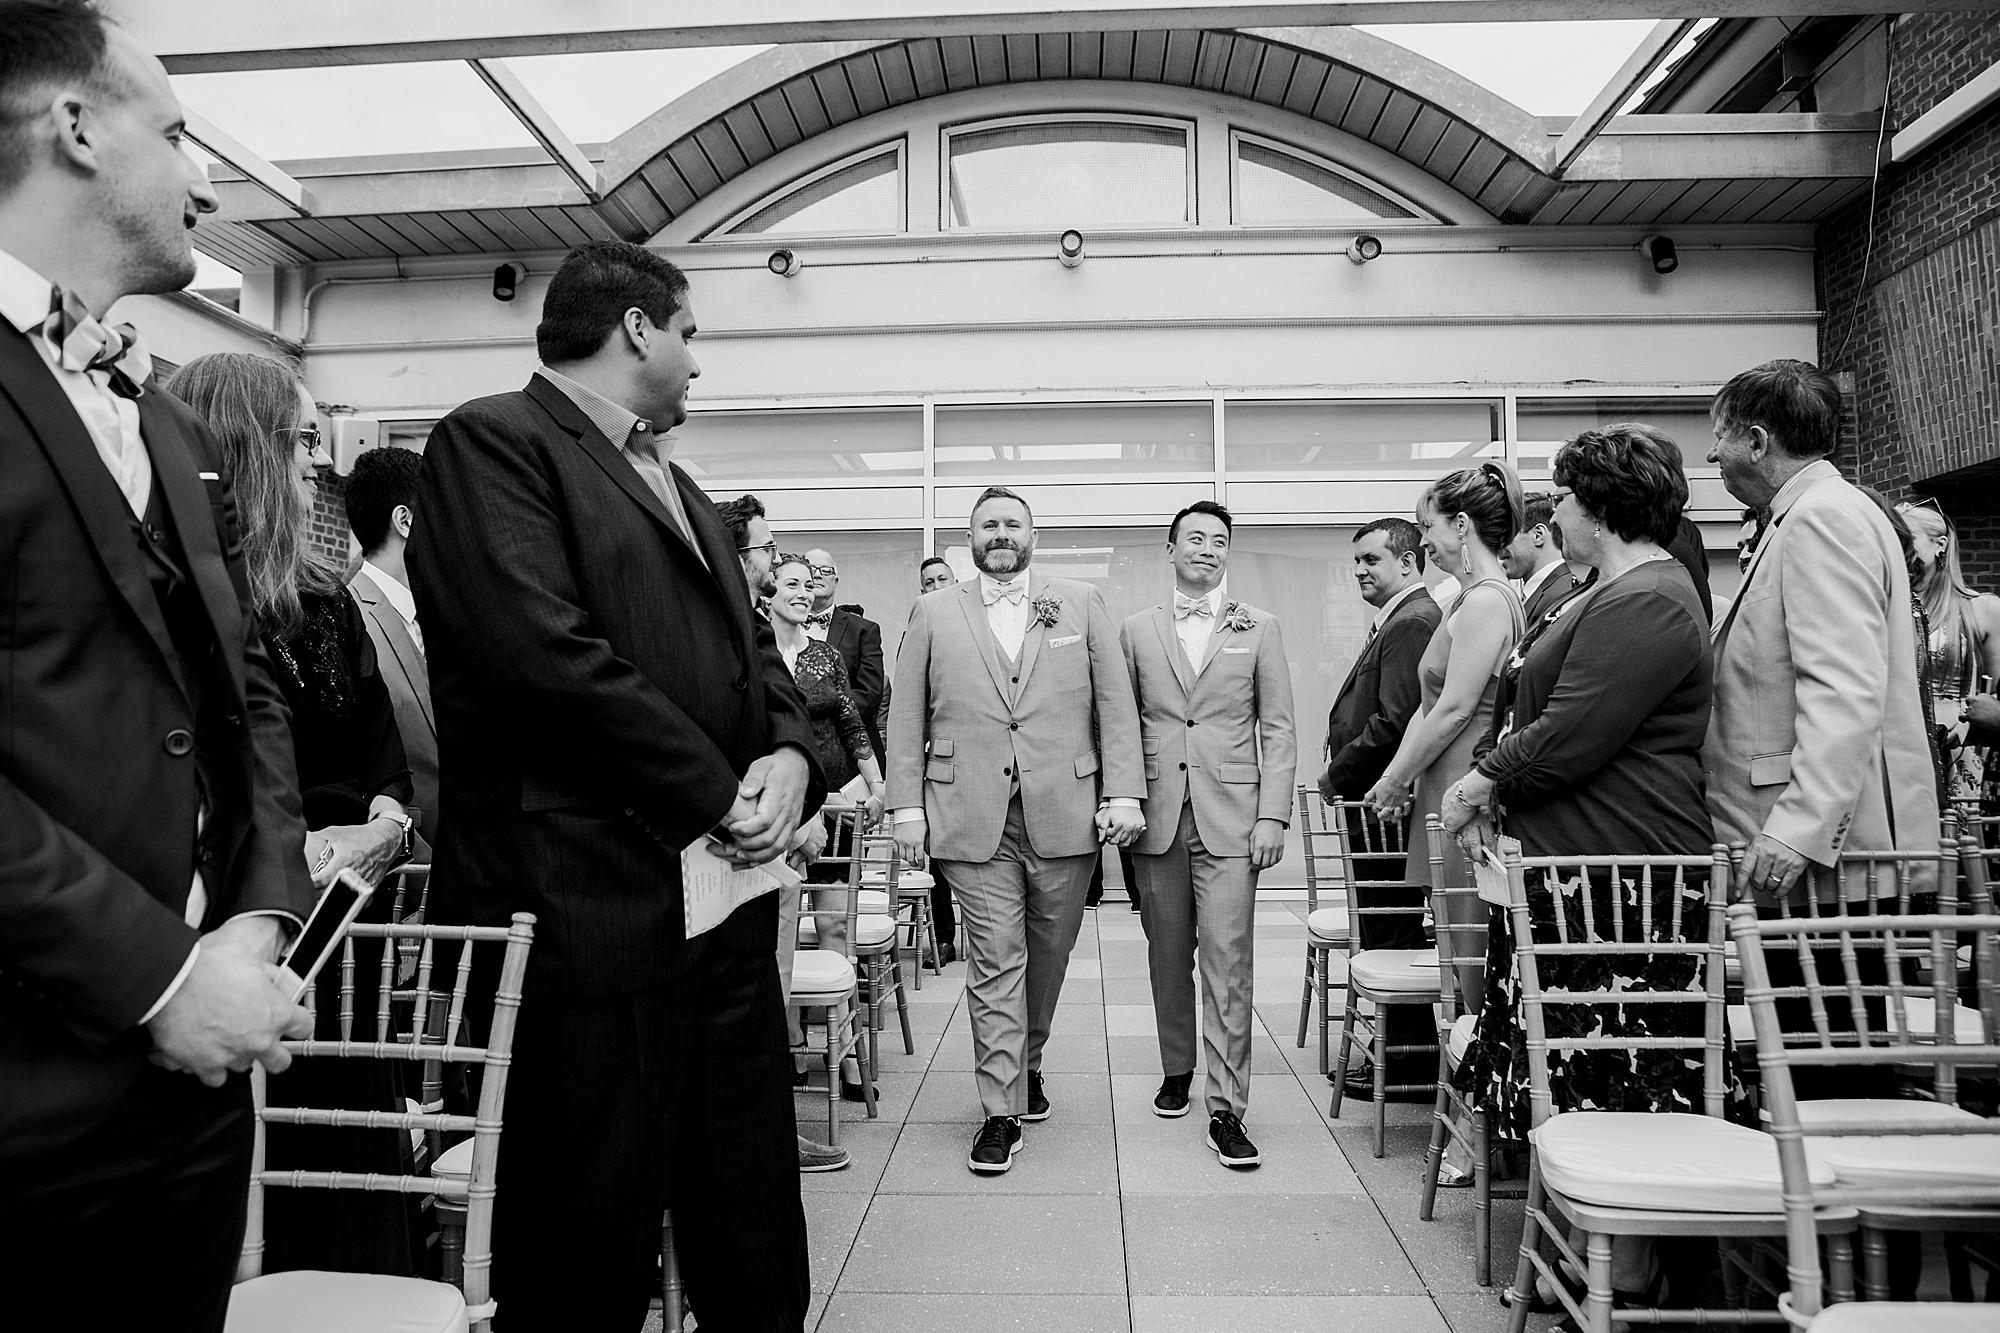 Dan_and_Byron_Love_by_Joe_Mac_Philadelphia_Wedding_LGBTQ_Photography_Gay_Independence_visitor_Center_79.JPG